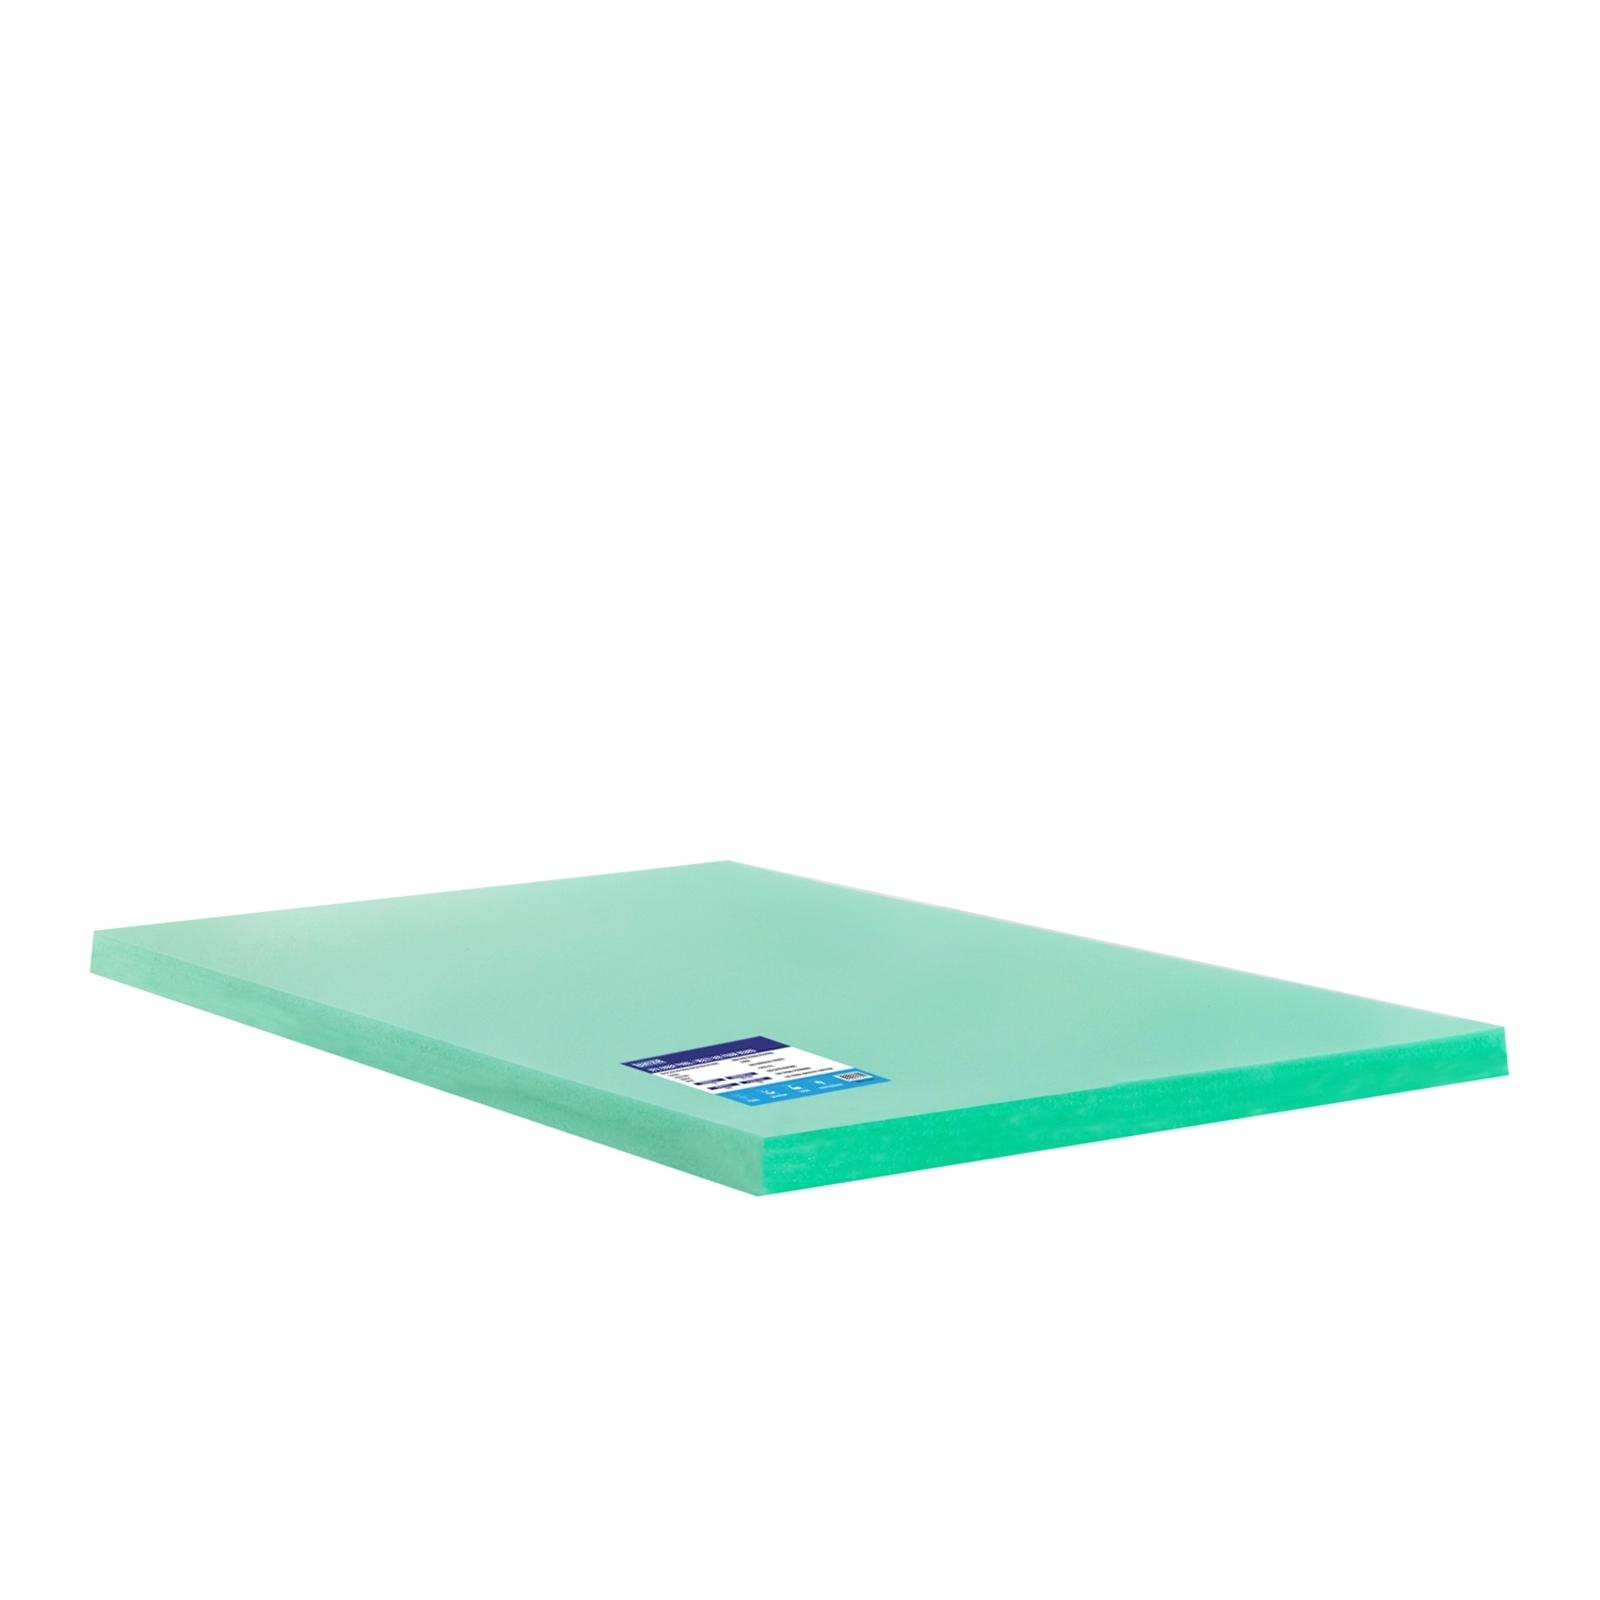 Bastion 1200 x 600 x 30mm XPS Multi-Use Insulation Foam Board